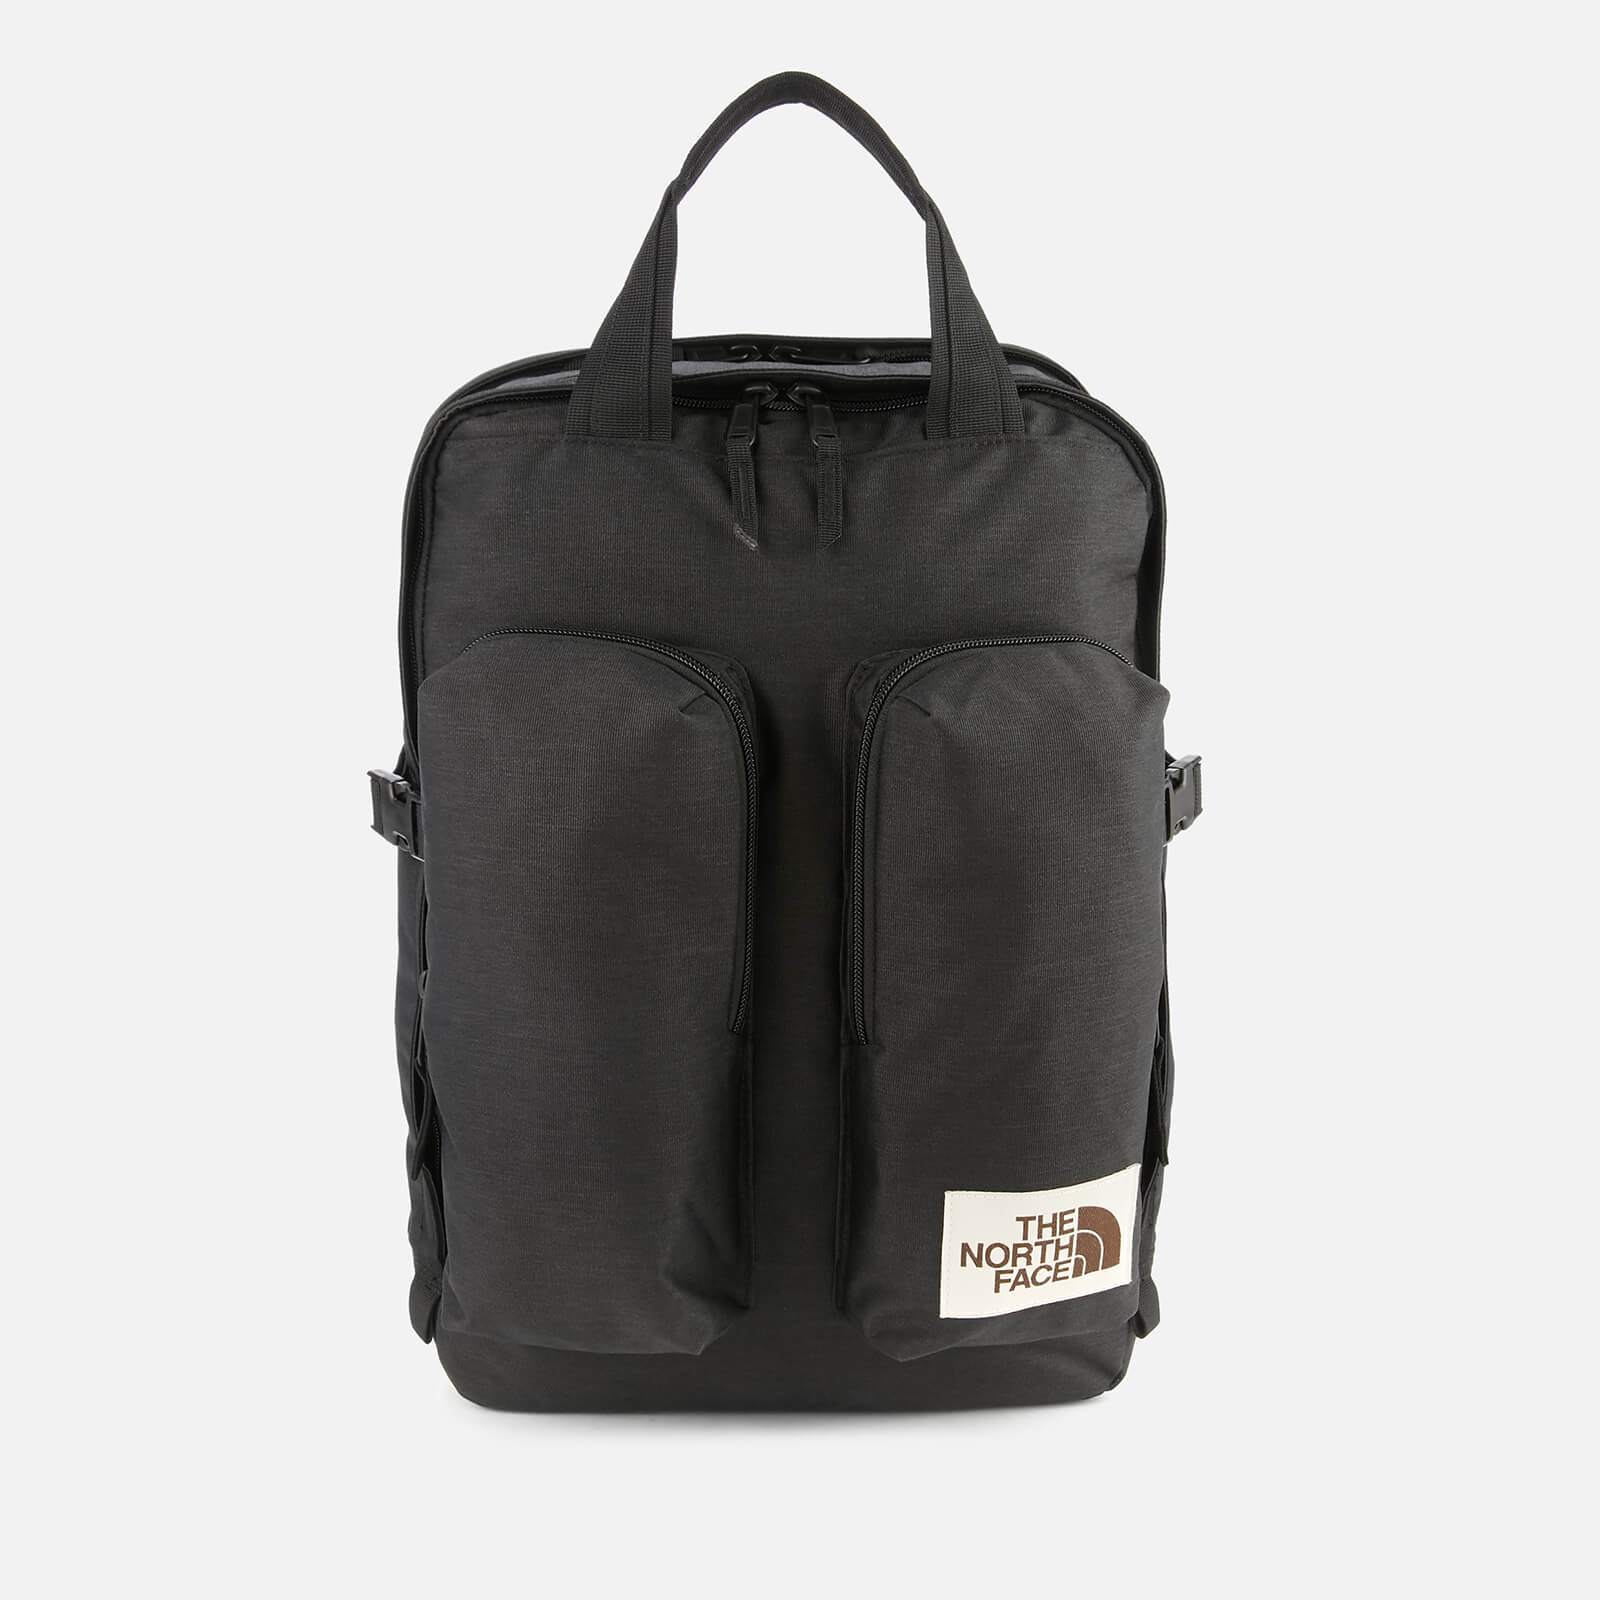 The North Face Men's Mini Crevasse Bag - TNF Black